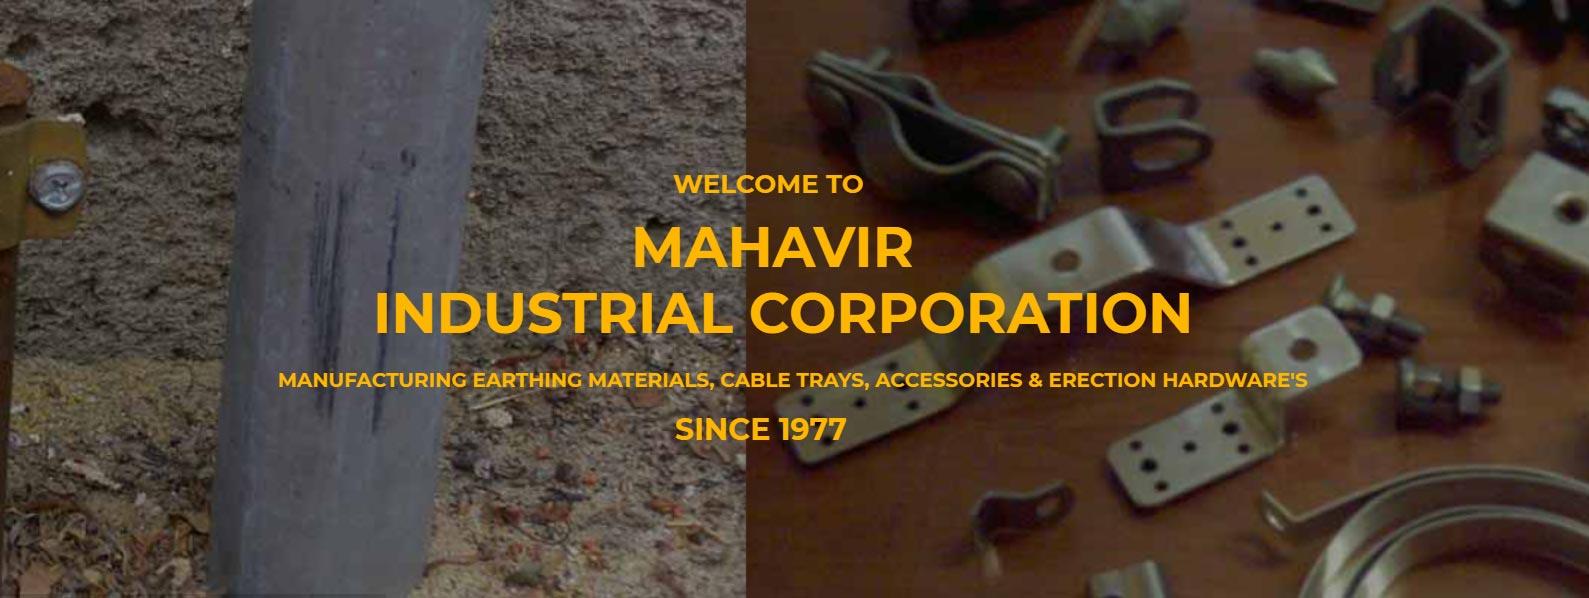 Mahavir Industrial Corporation